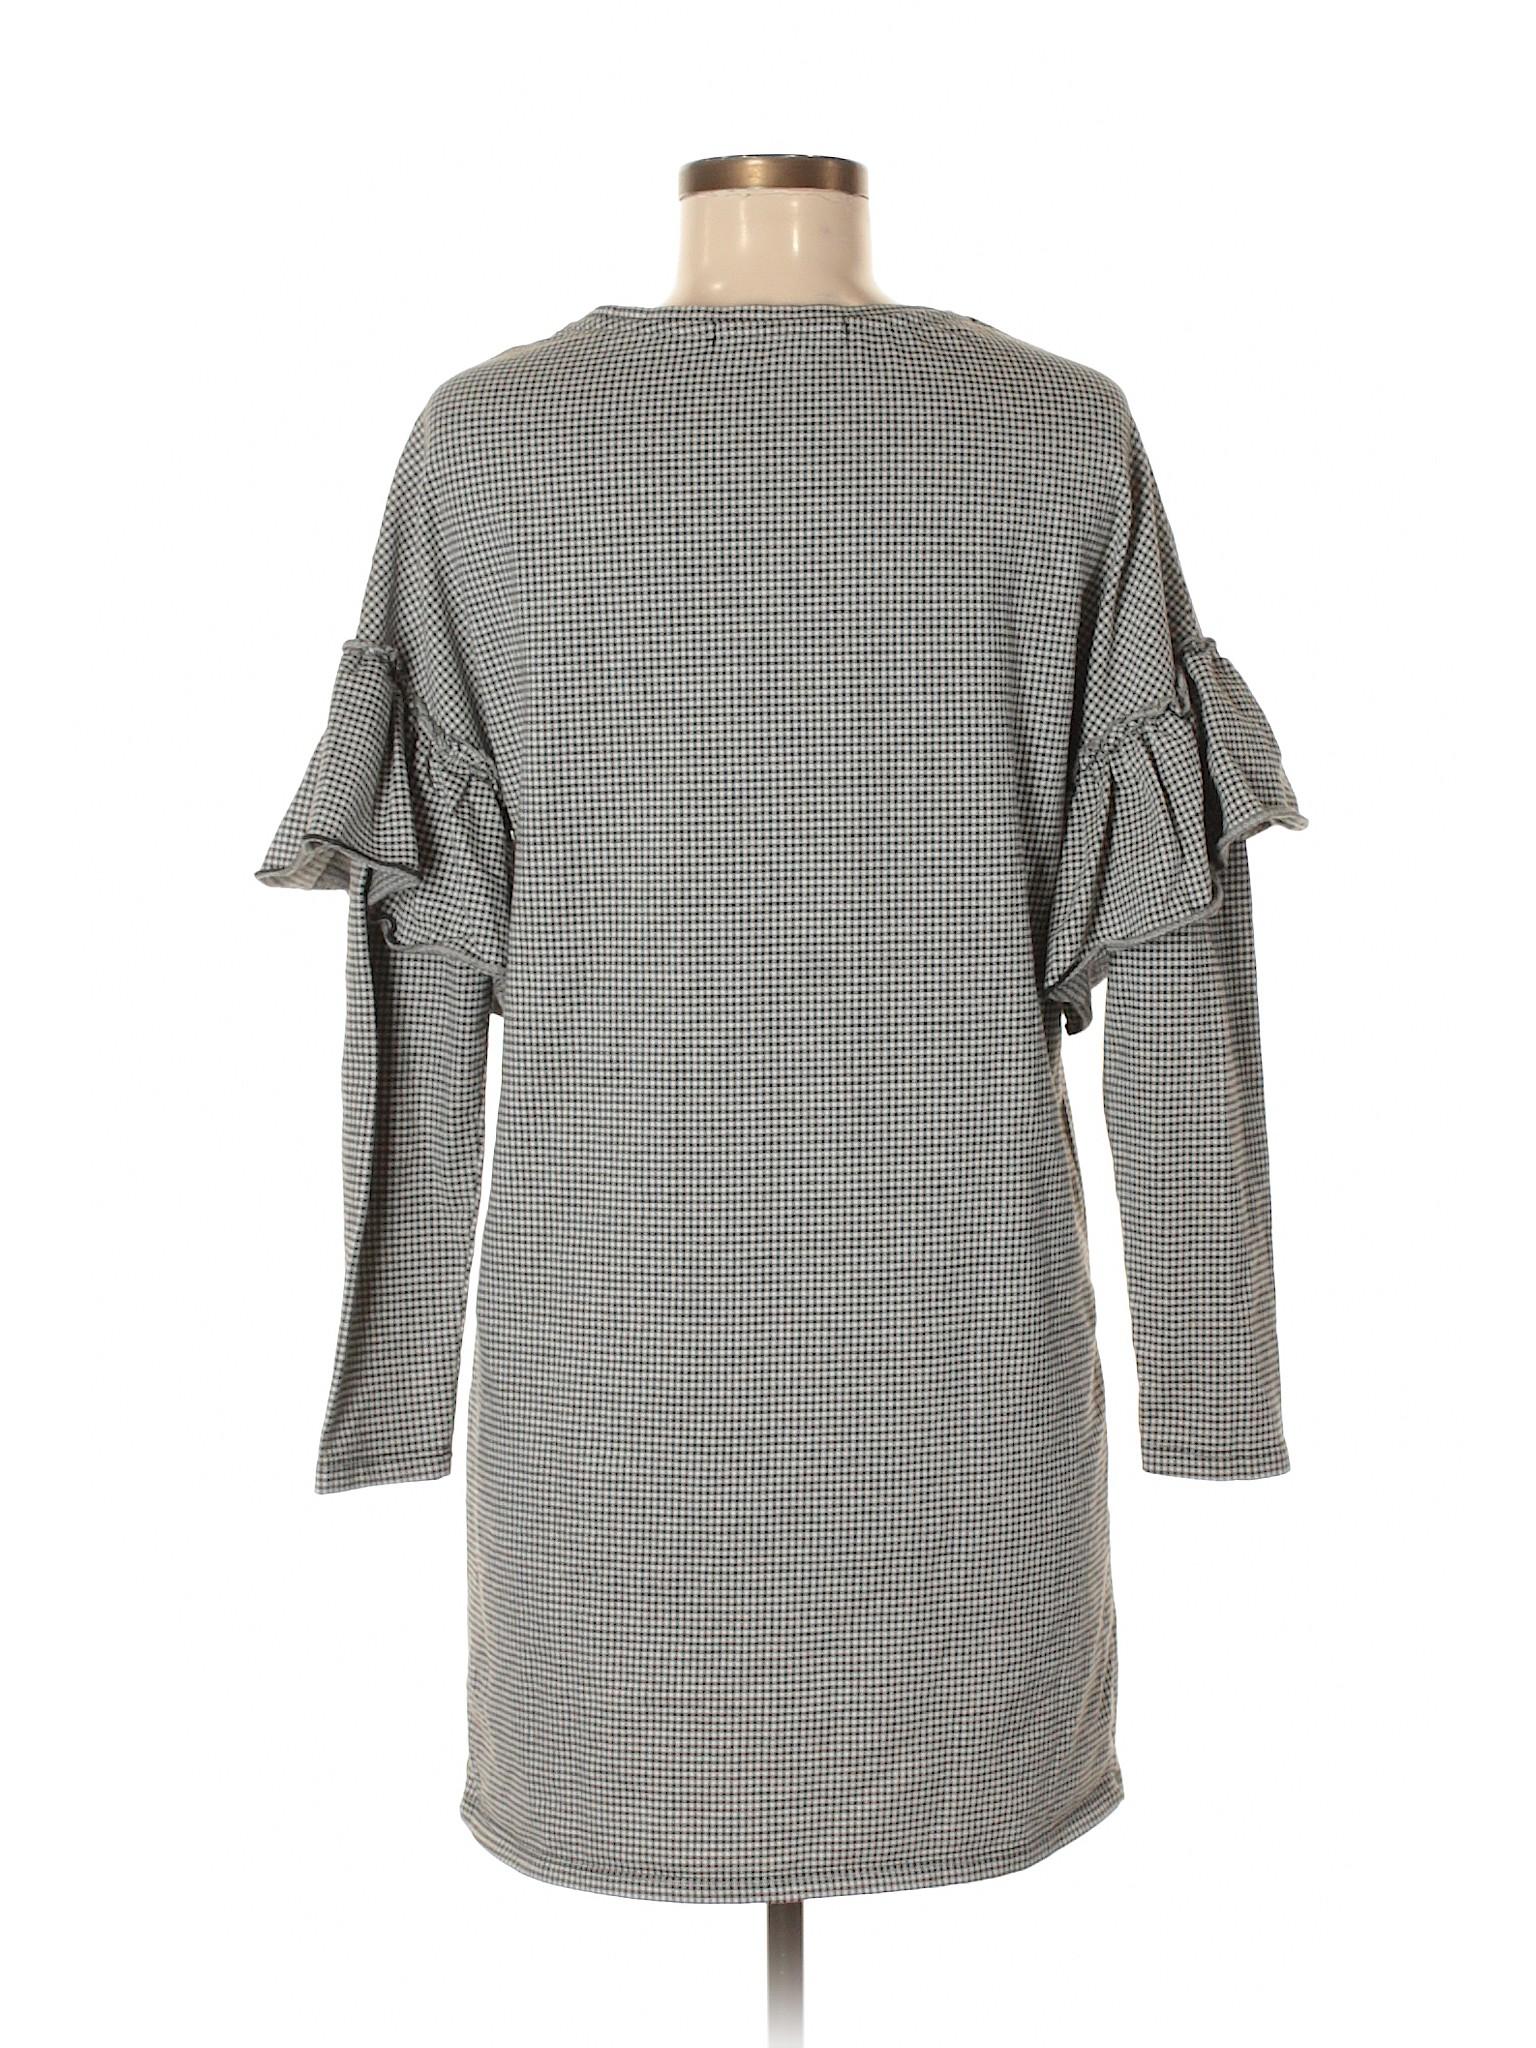 Selling Dress Dress Casual Dress Bershka Casual Selling Bershka Casual Selling Bershka 5rqw5R16n